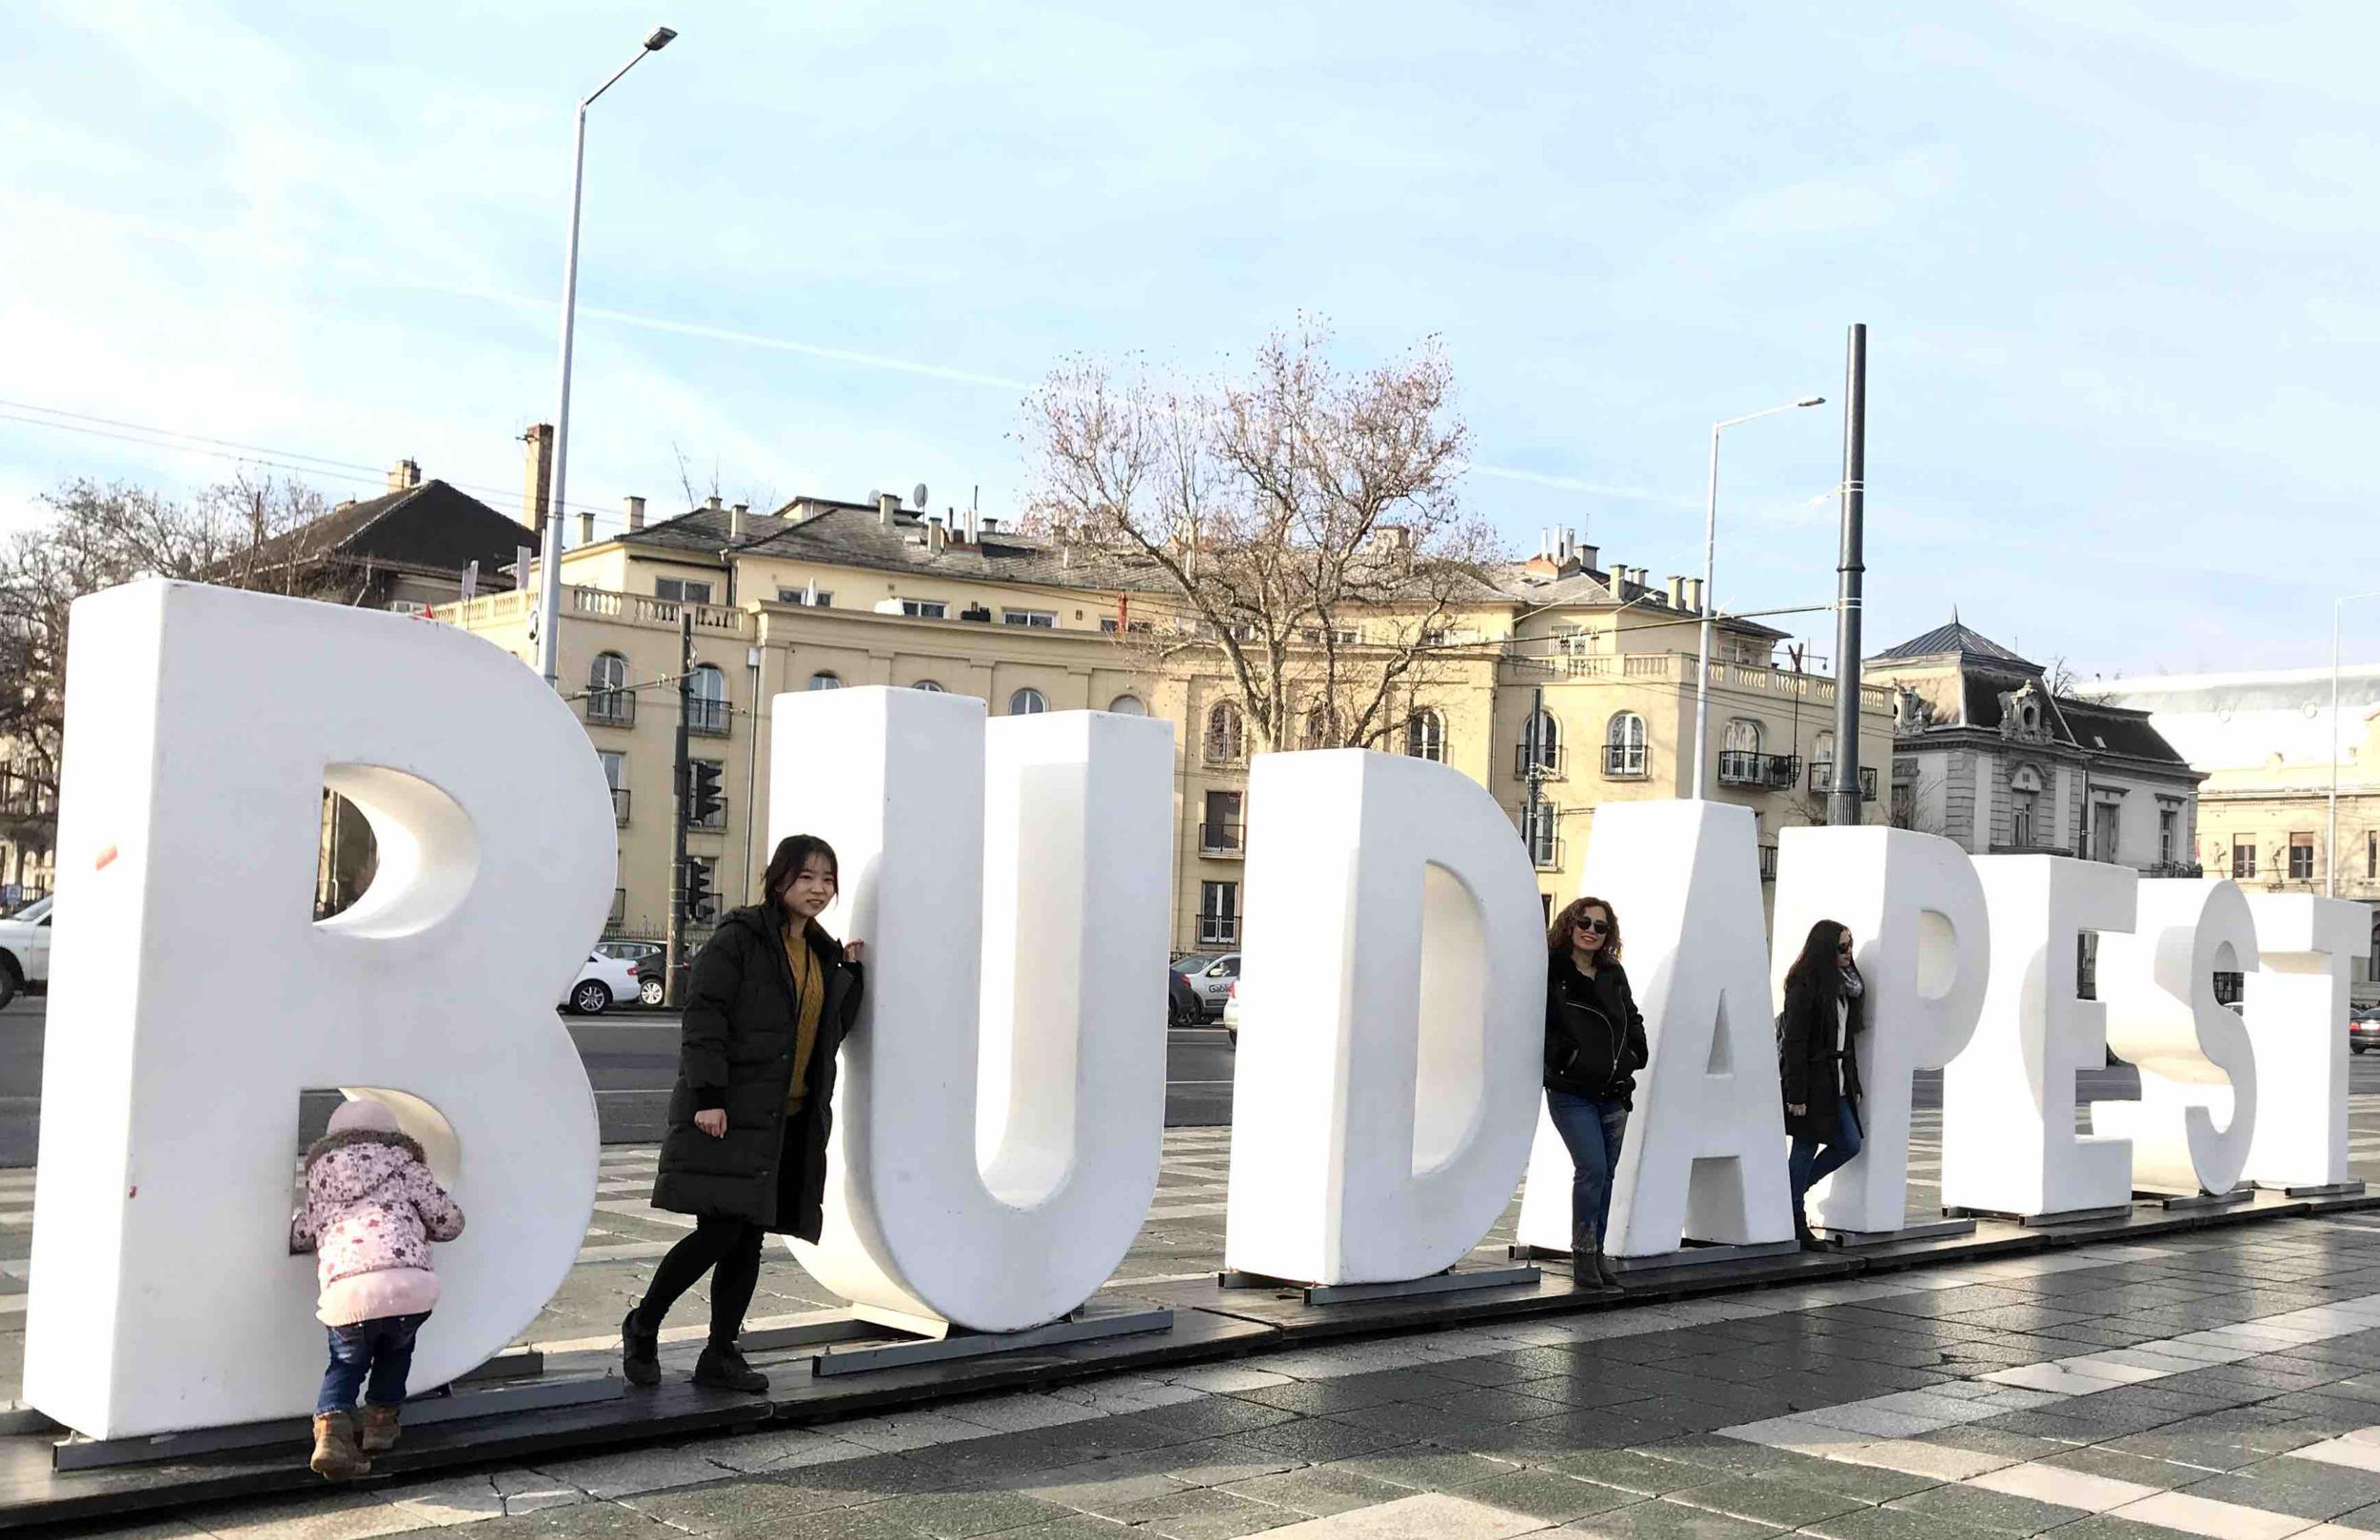 BUDAPESTWordSculptureCROPPED.png